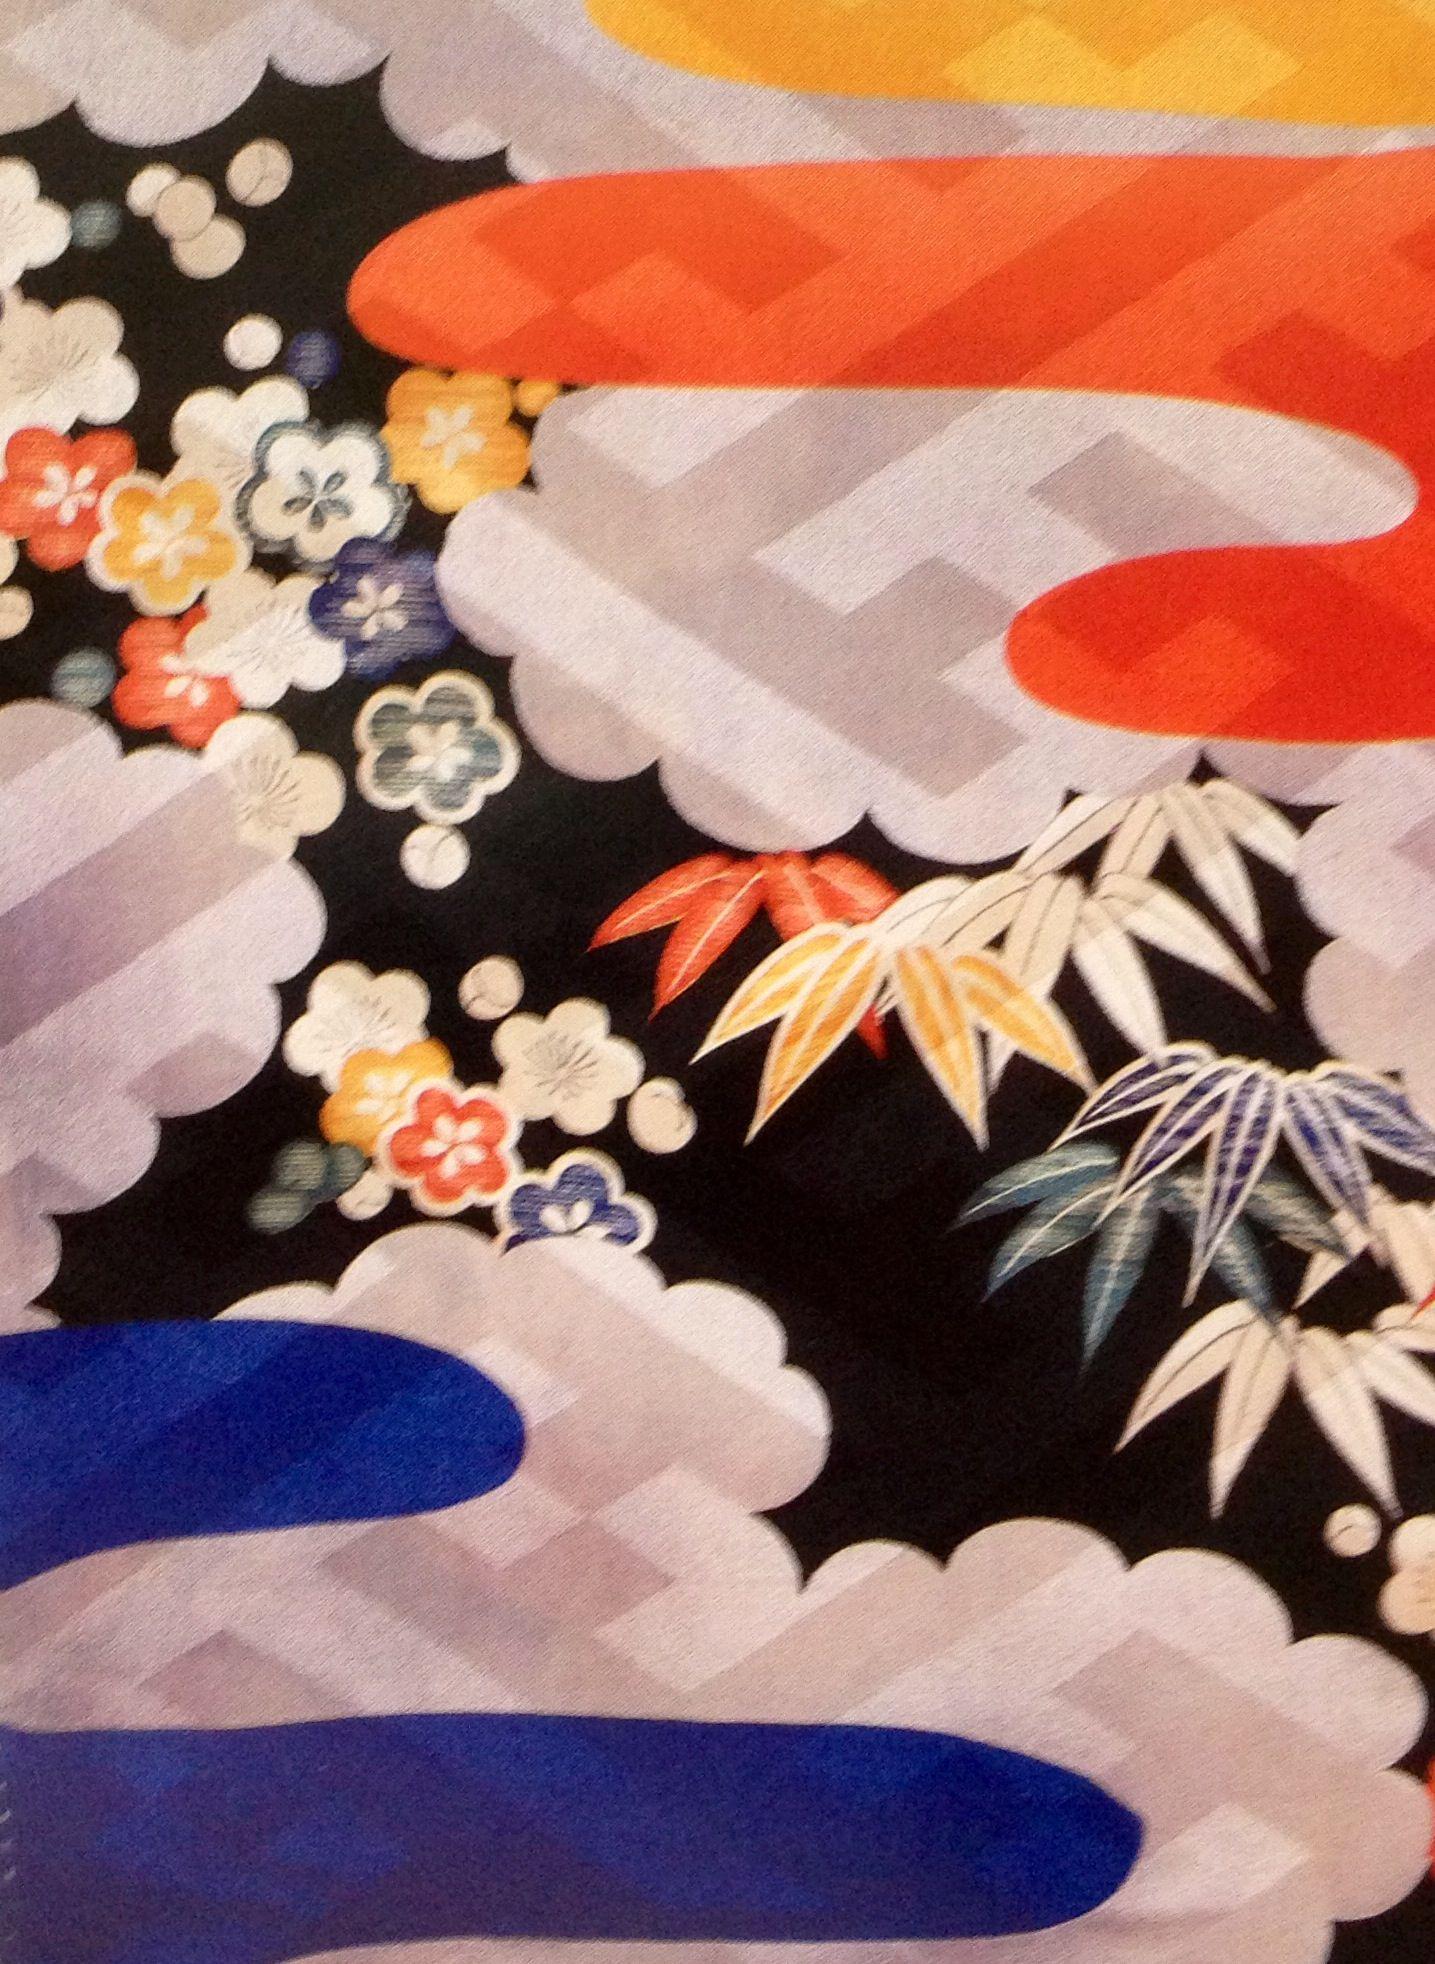 Vintage Kimono Japanese Fabric 1987 Japanese Embroidery Sewing